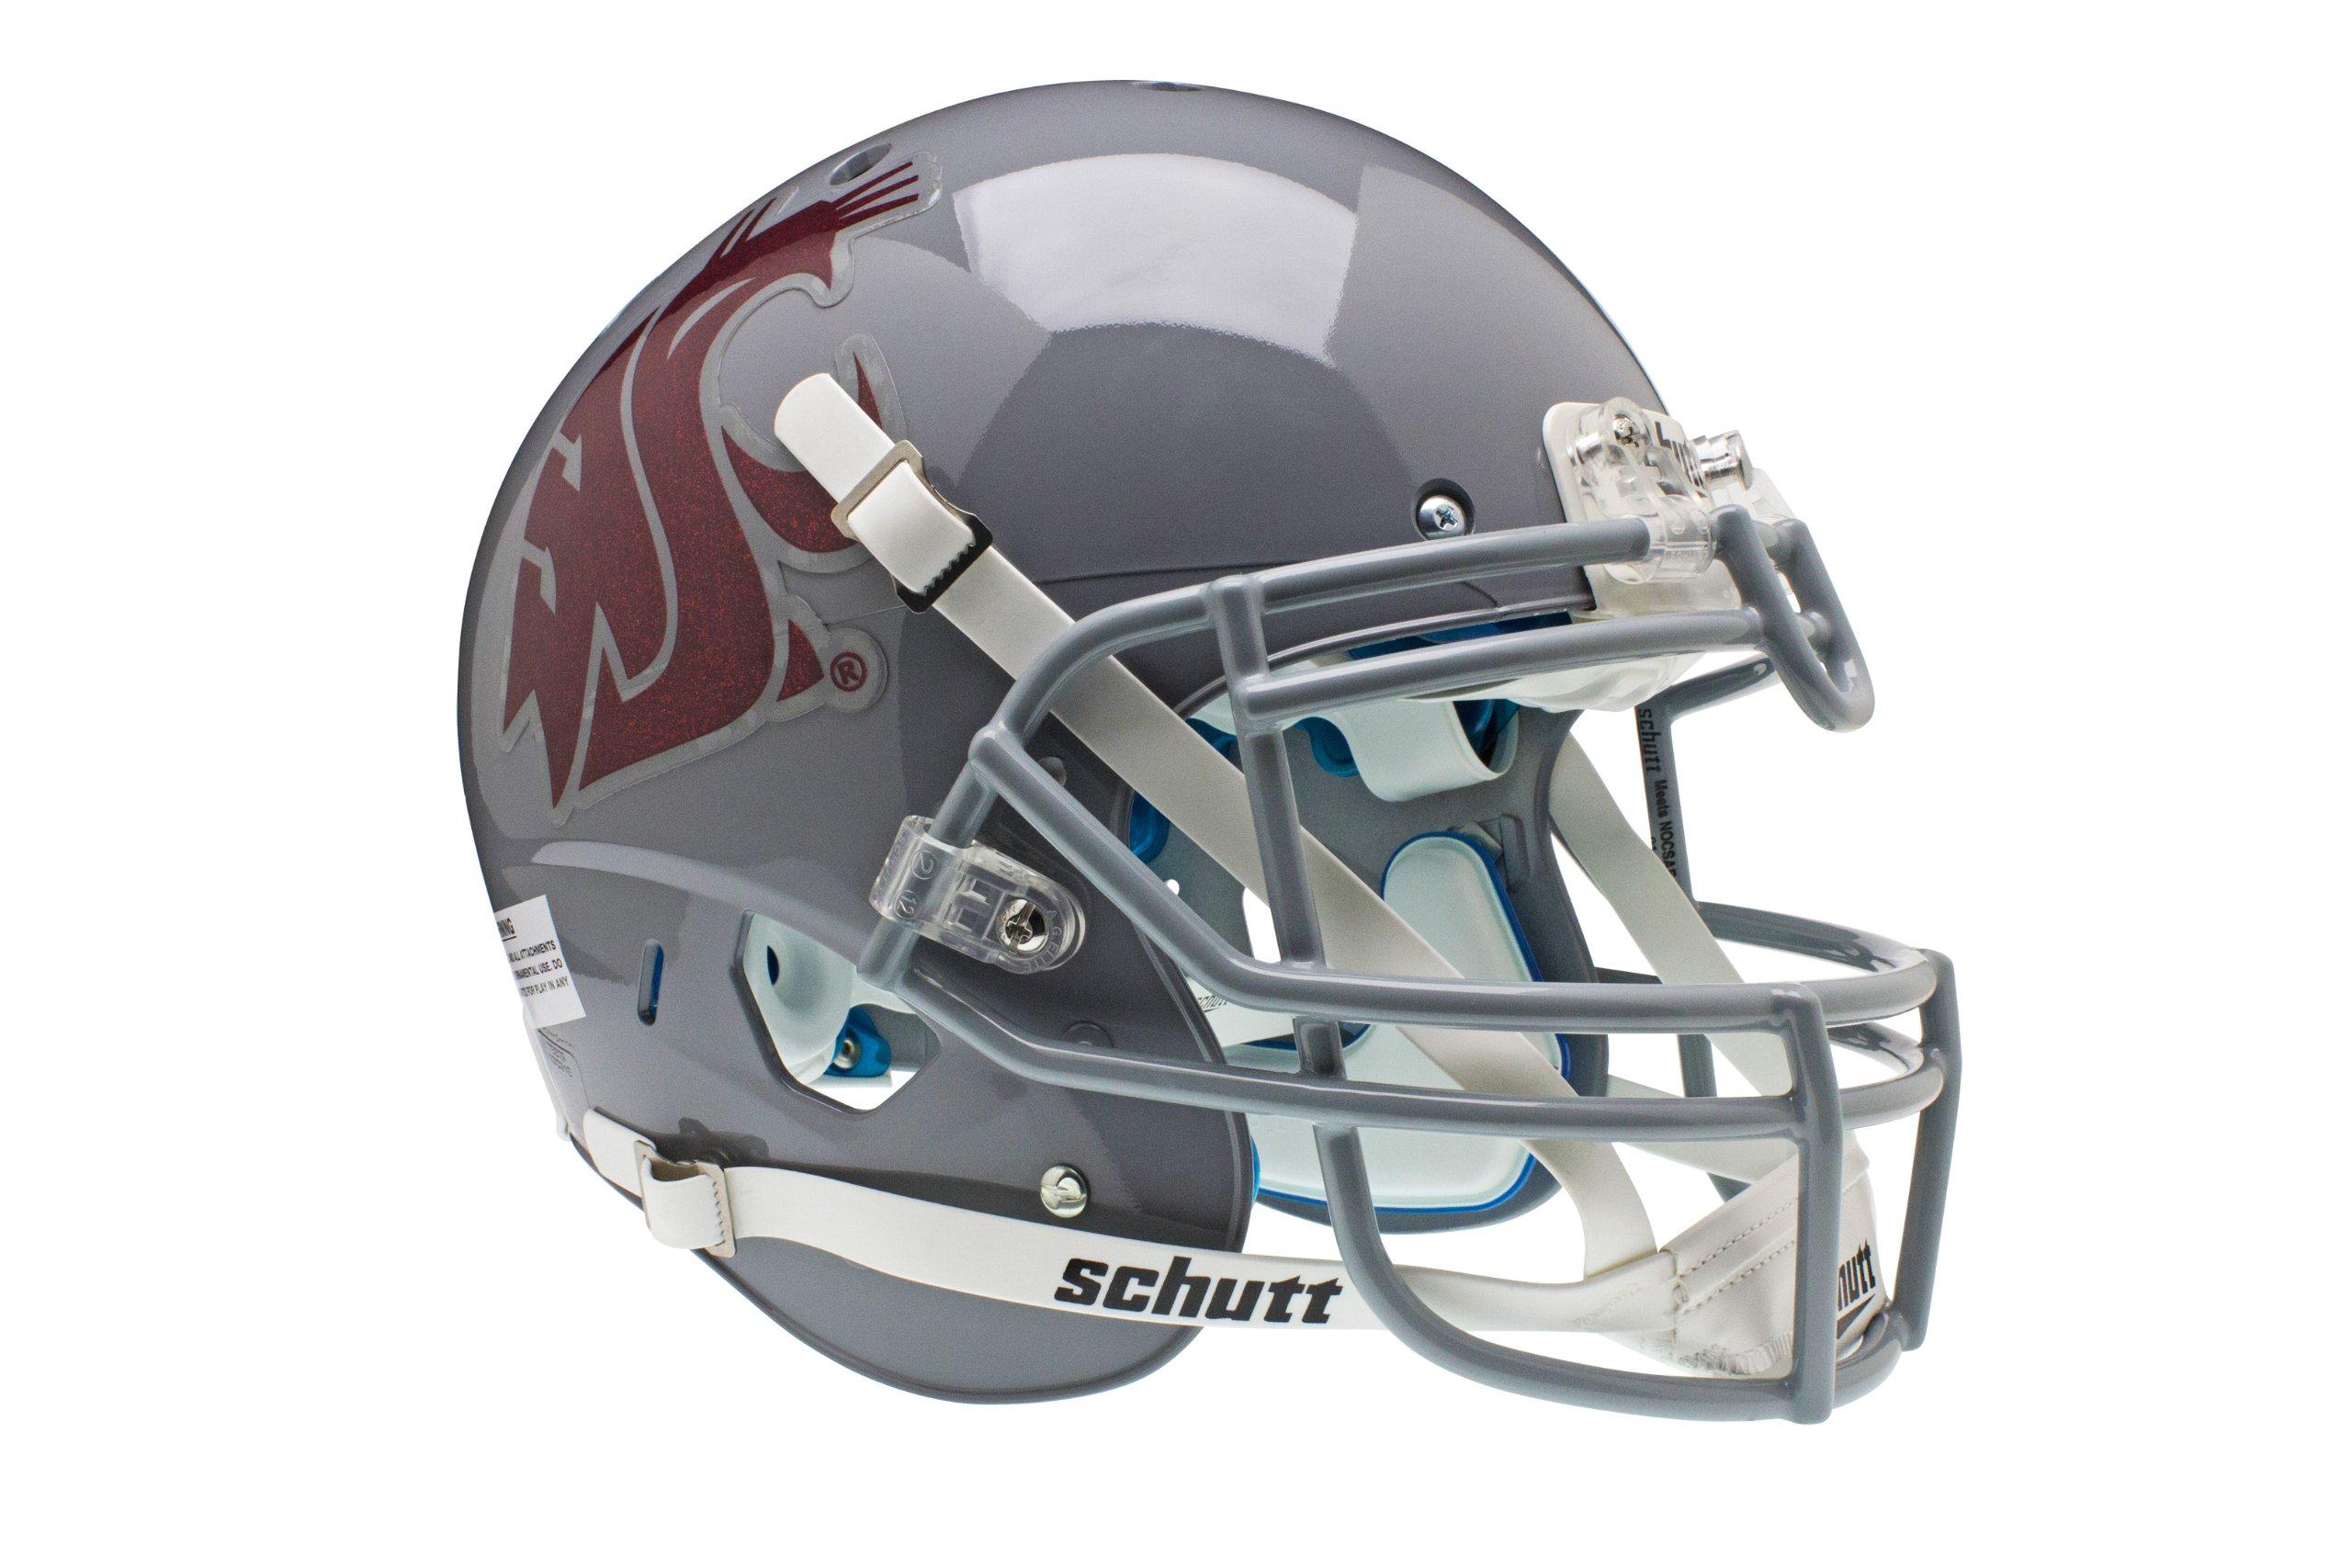 NCAA Washington State Cougars Authentic XP Football Helmet